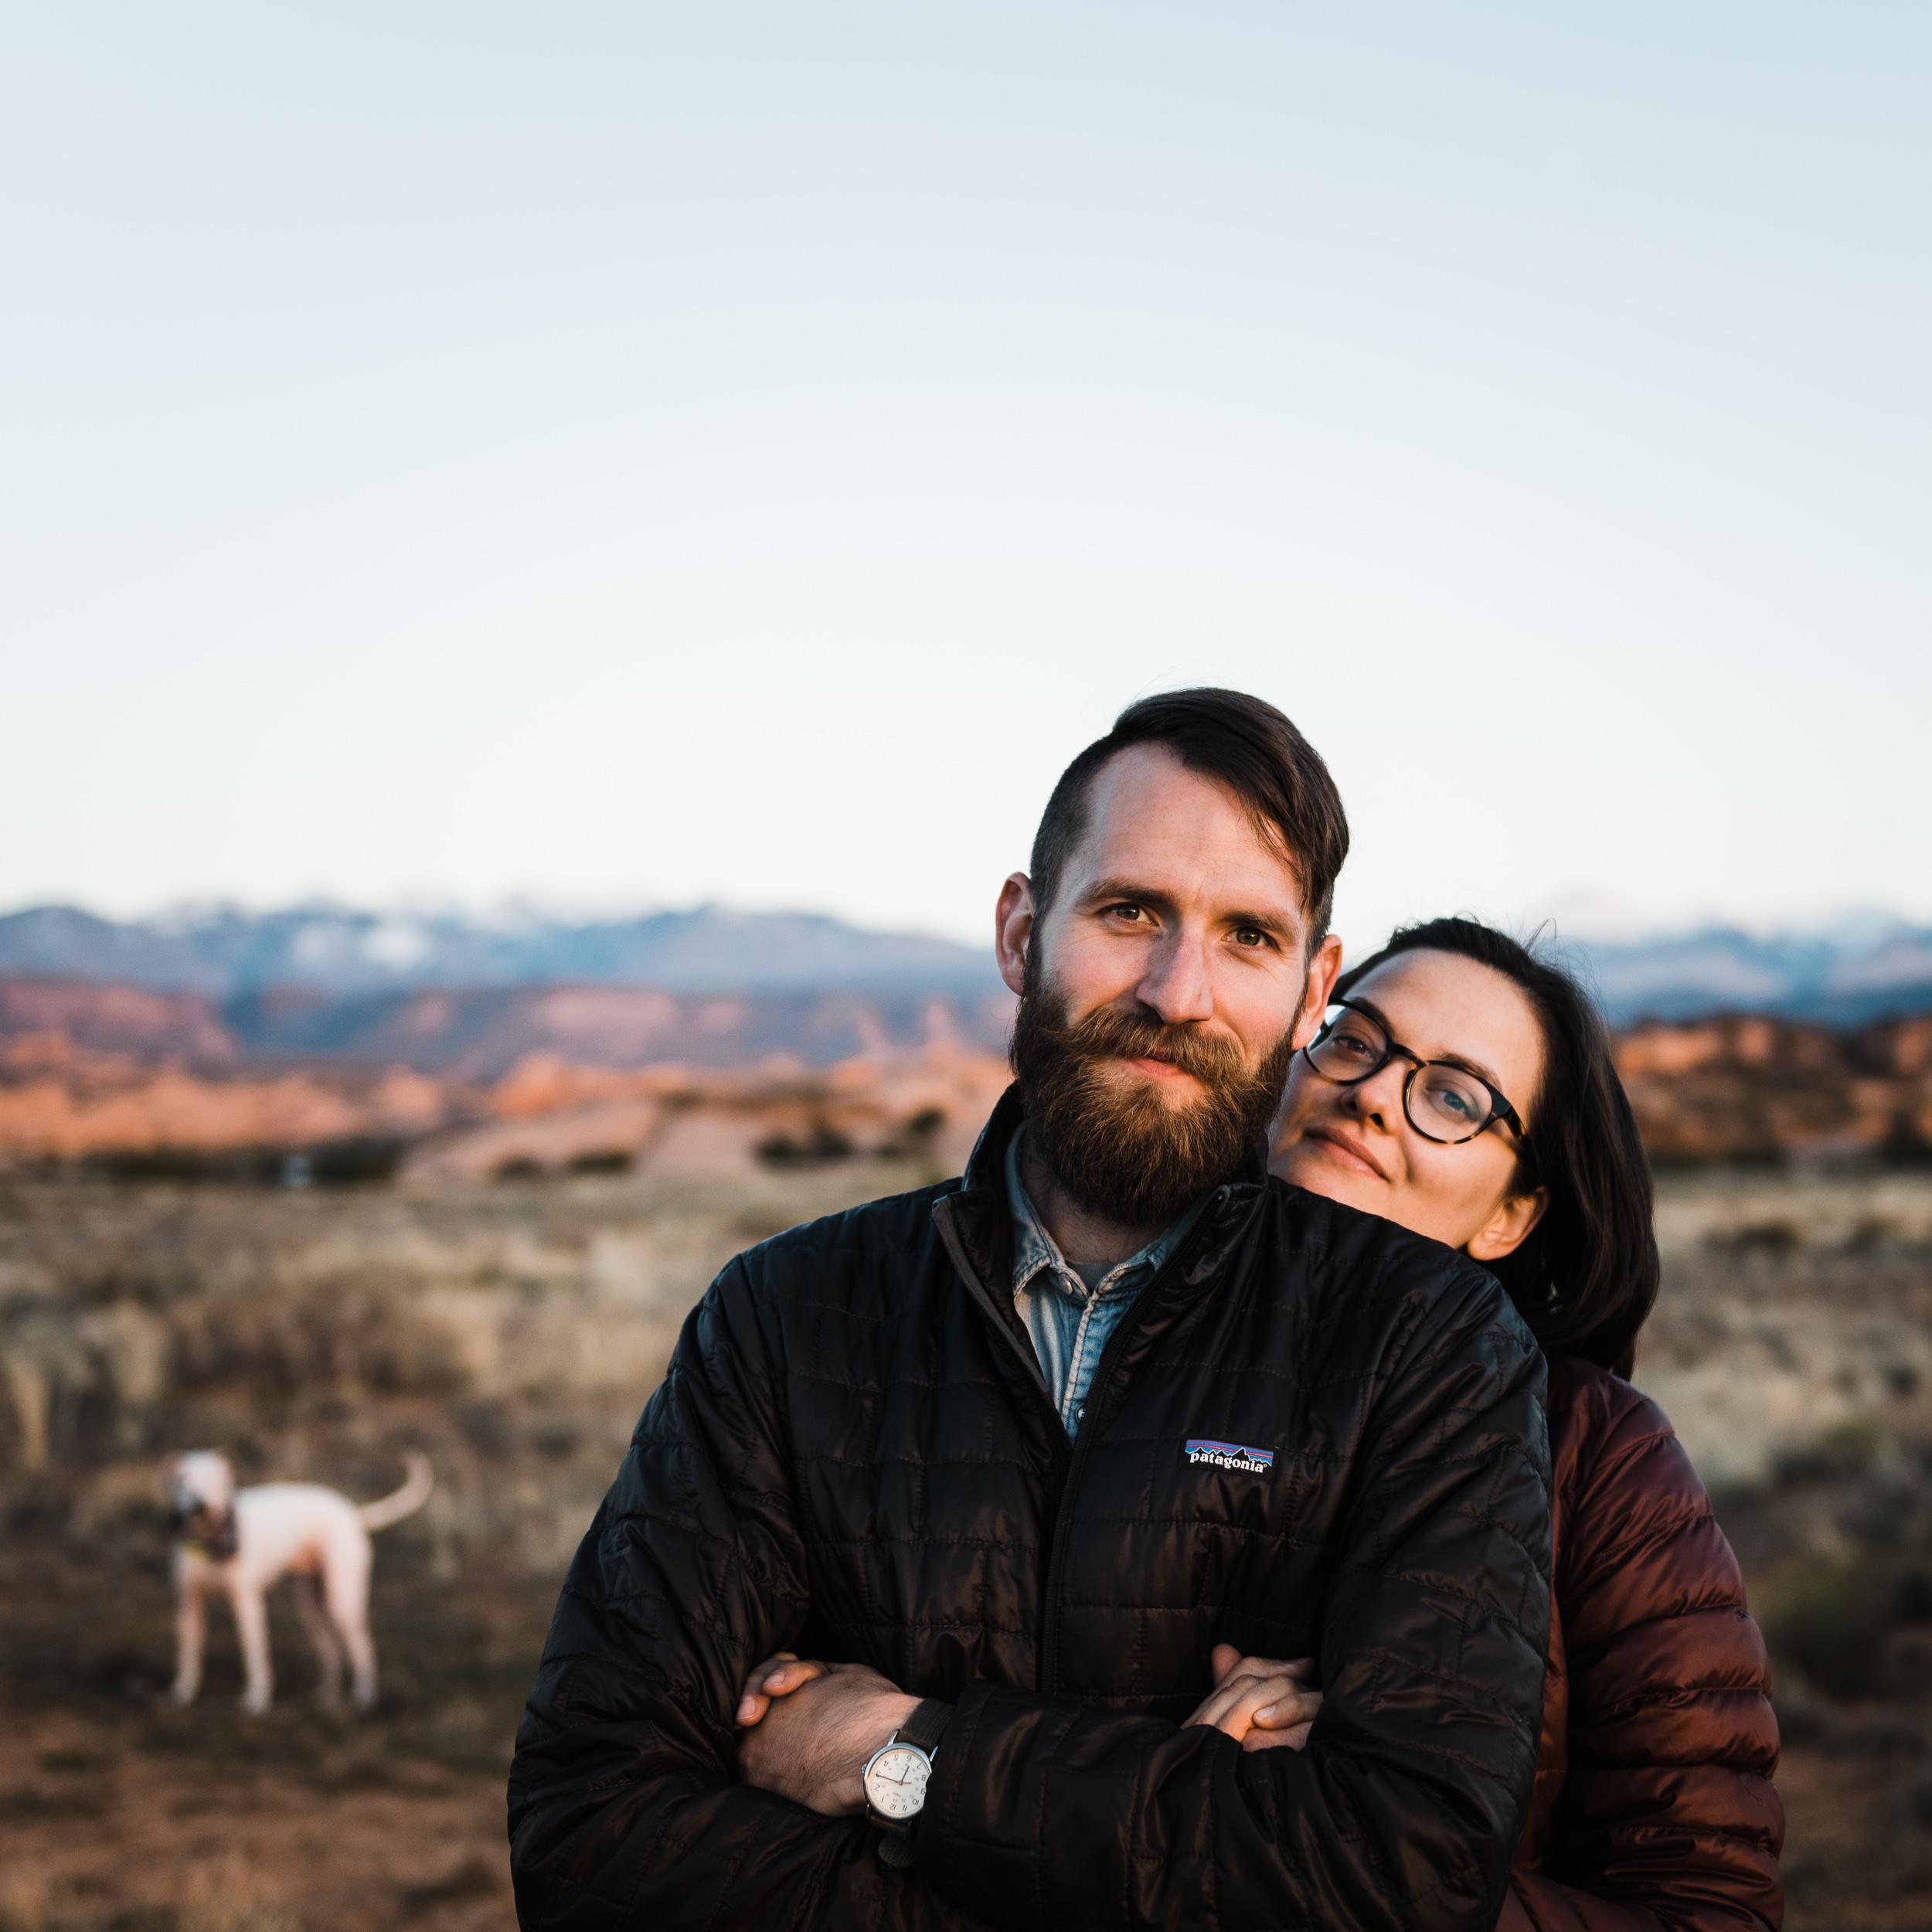 20181026-Moab-Arches-Jess-Austin-001.jpg